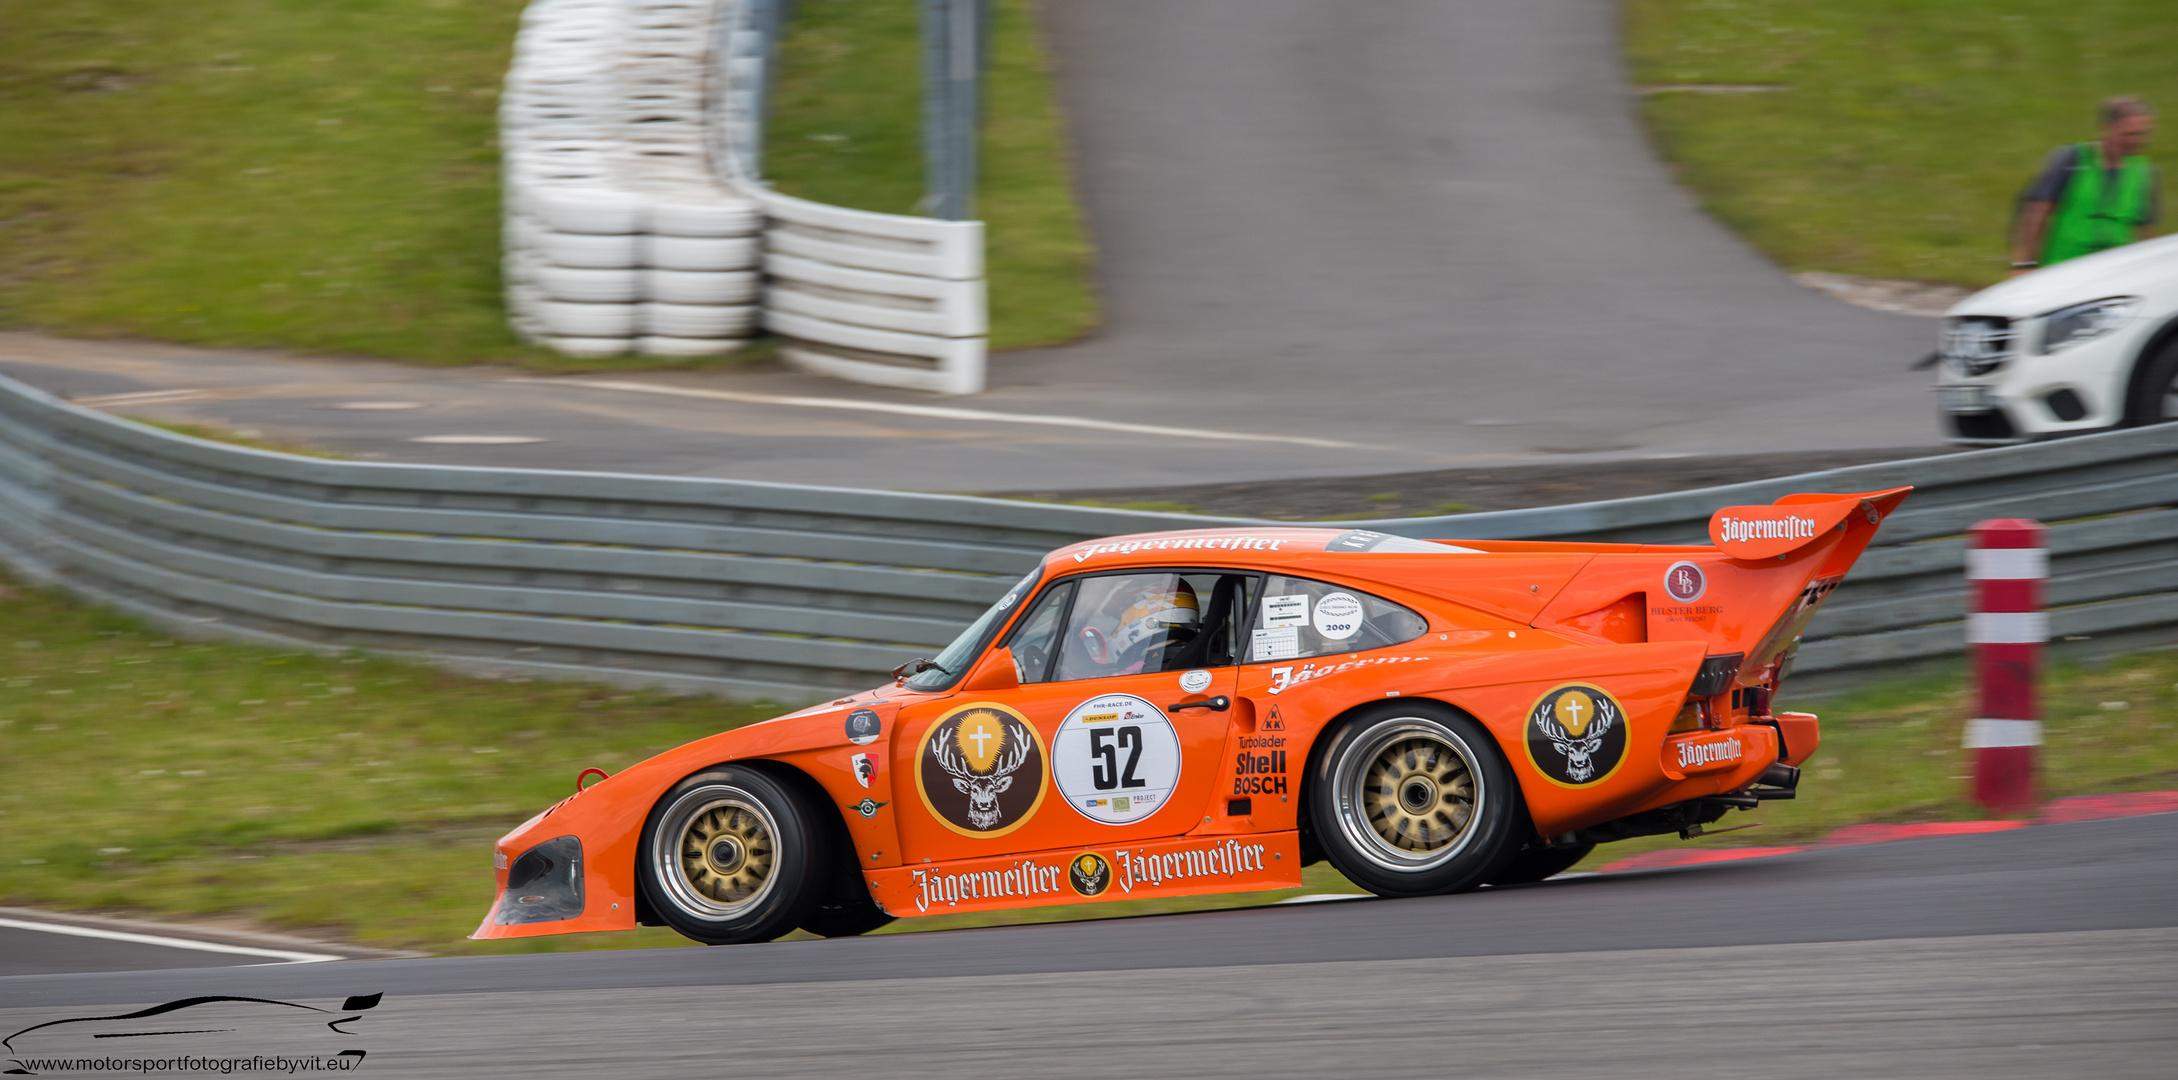 Porsche 935 K3 Part II